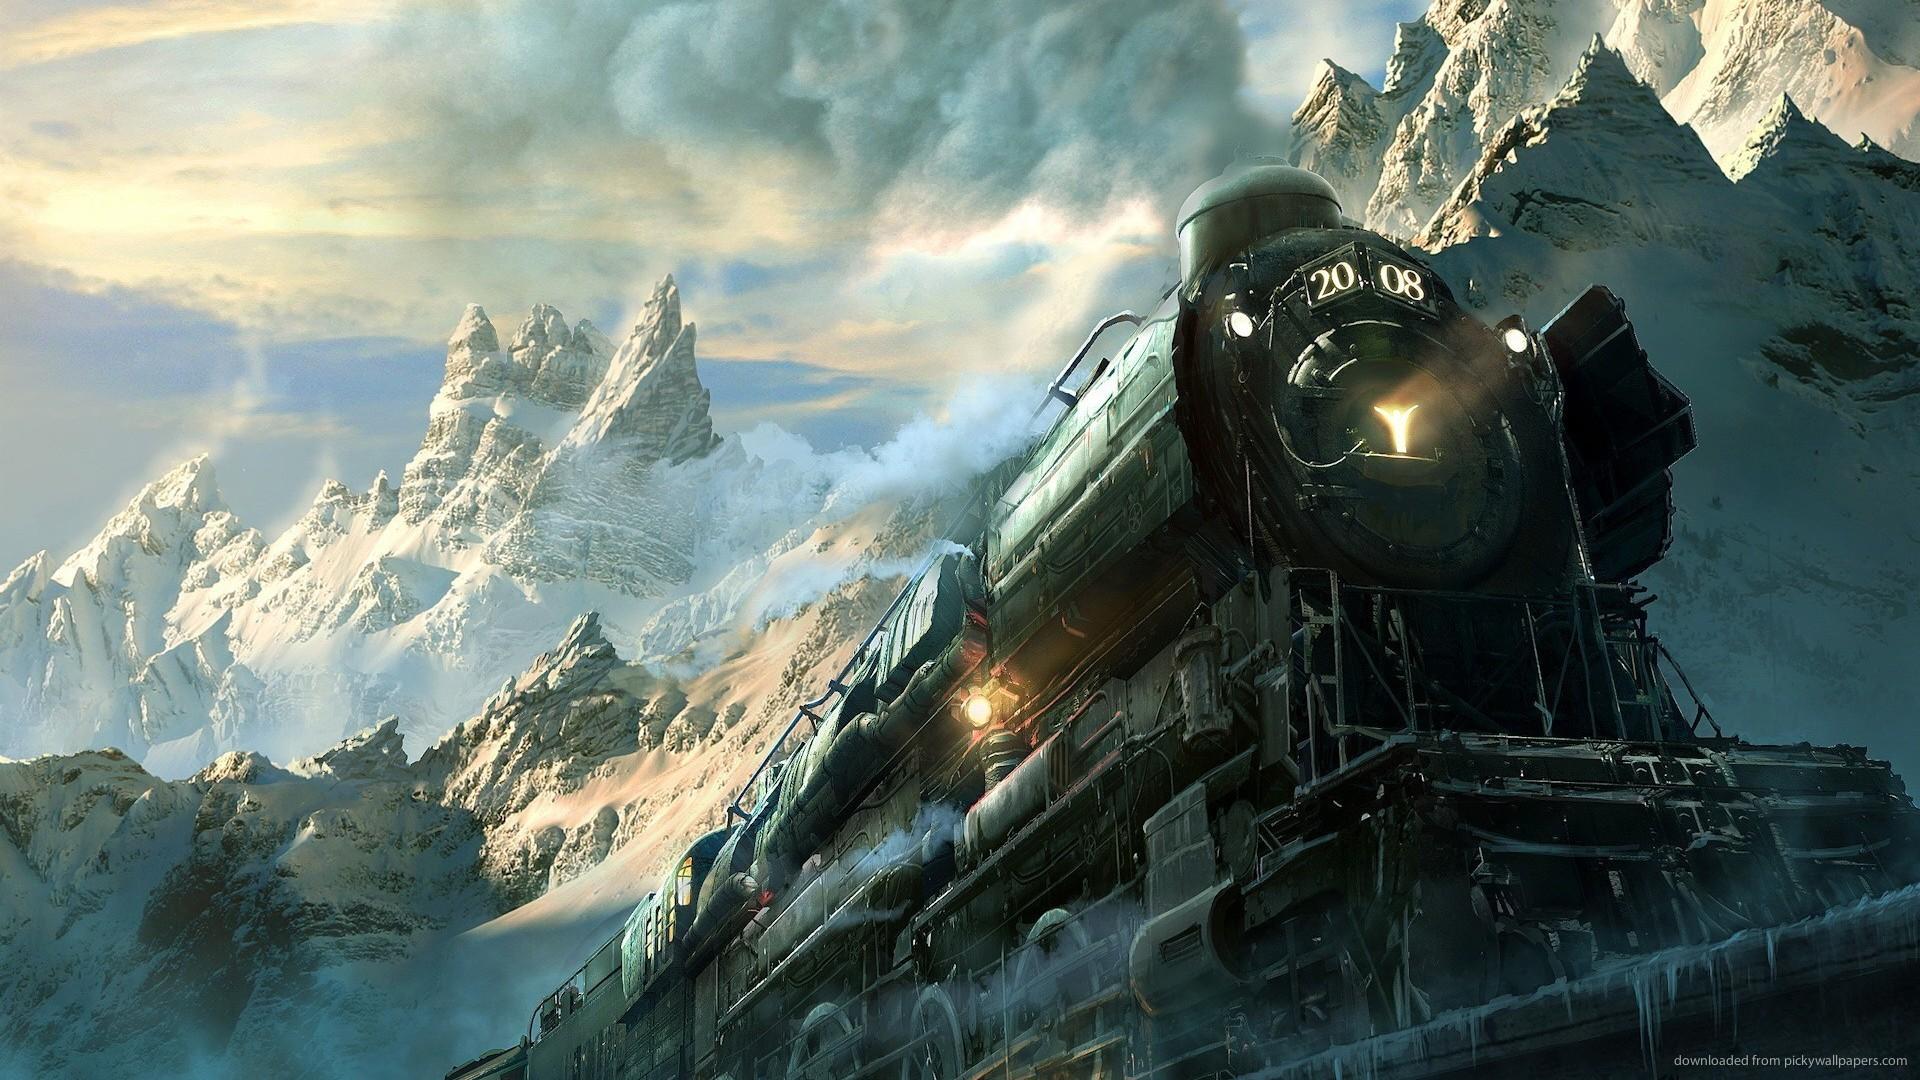 HD Epic Train Art Wallpaper 1920x1080